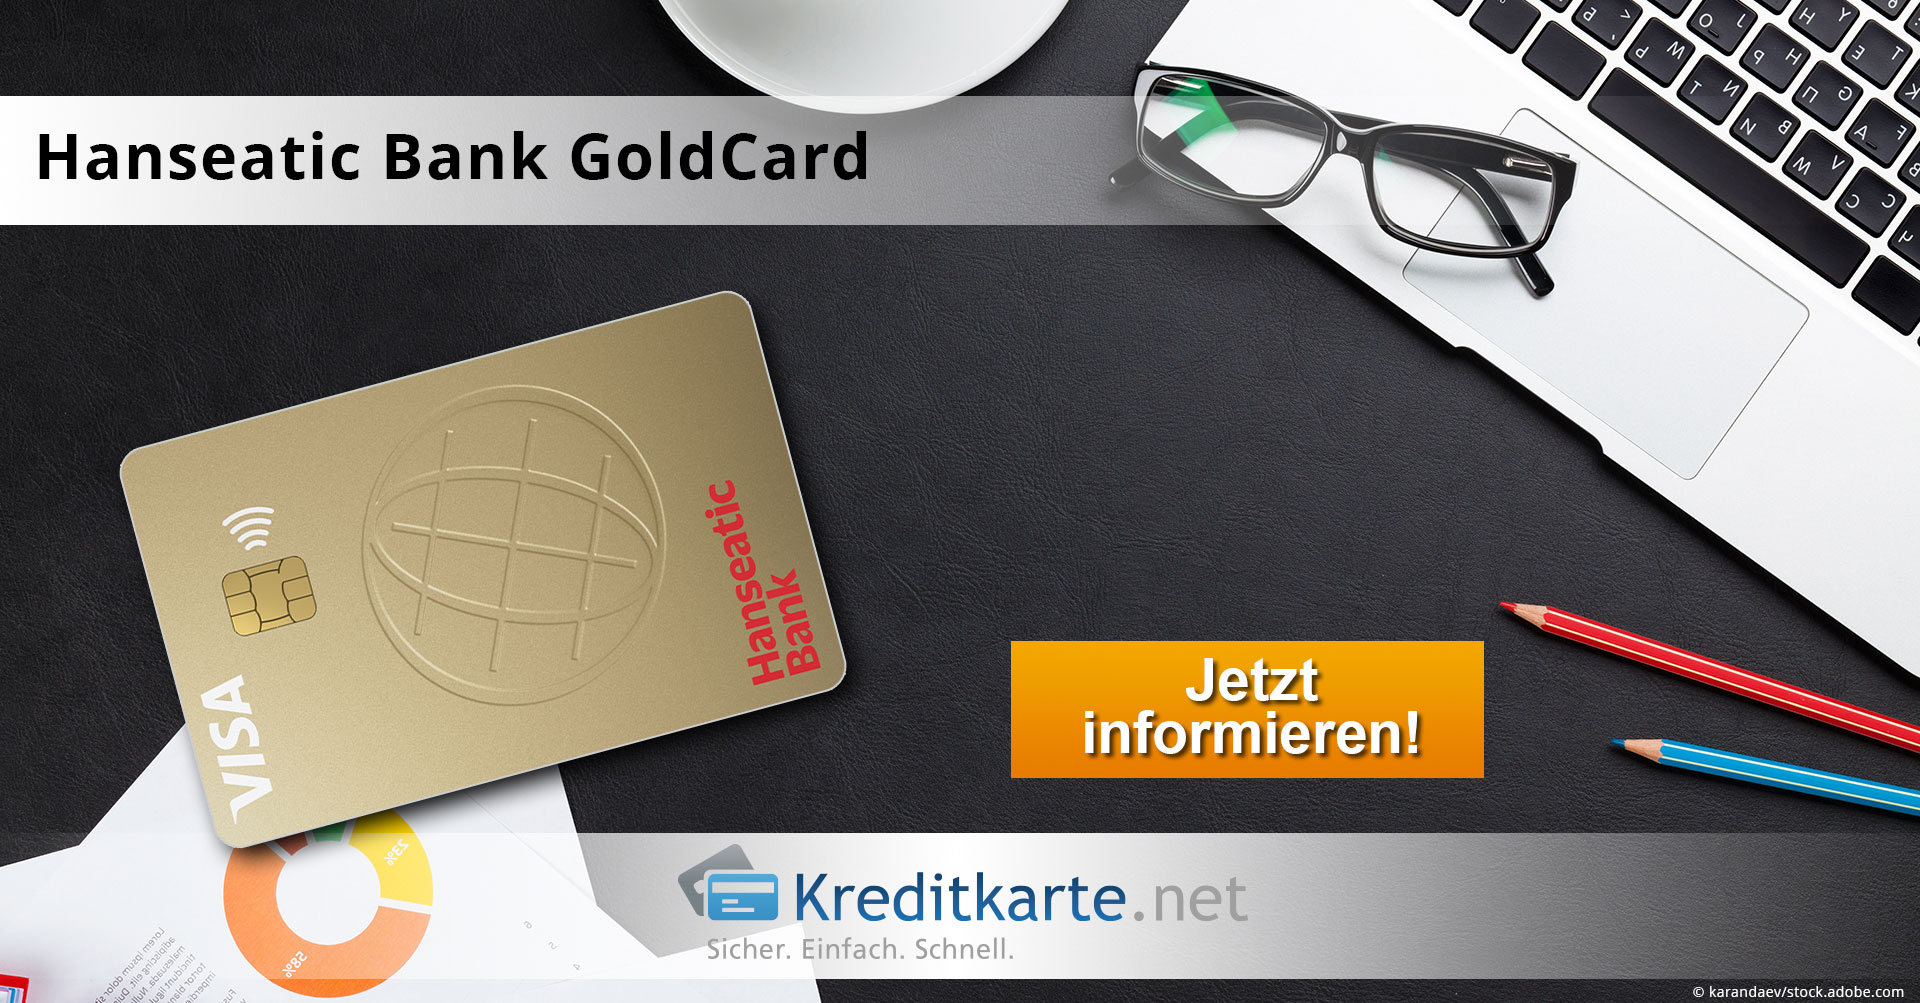 Die Hanseatic Bank Goldcard Uns Im Test